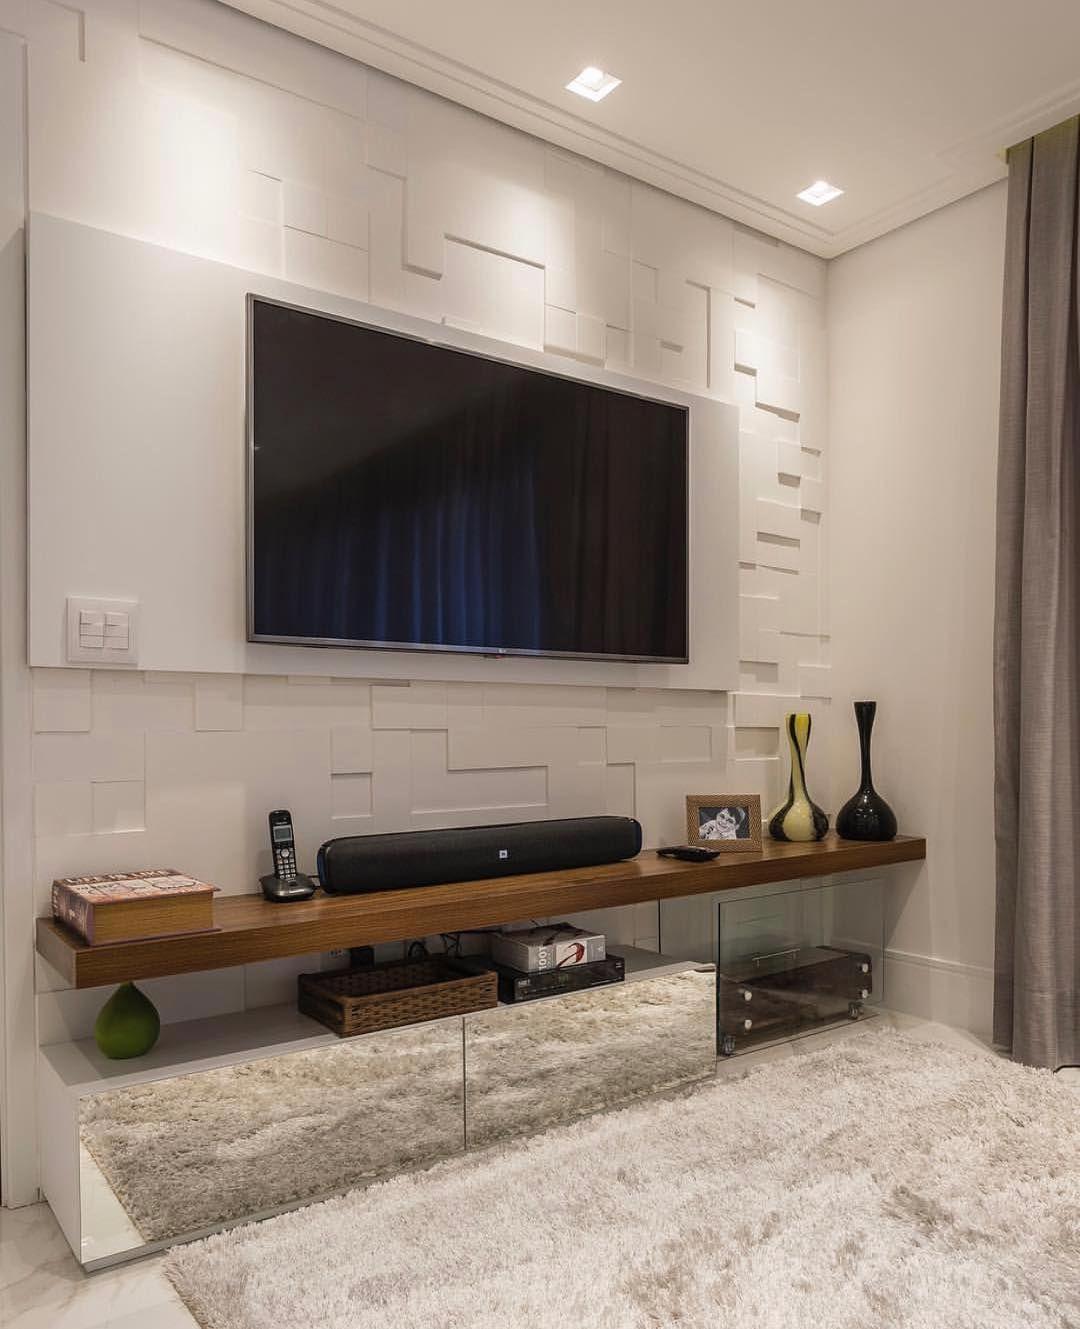 Pin By Avadhesh Patel On Home Decor: Arq•Home•Décor•Casa•Int